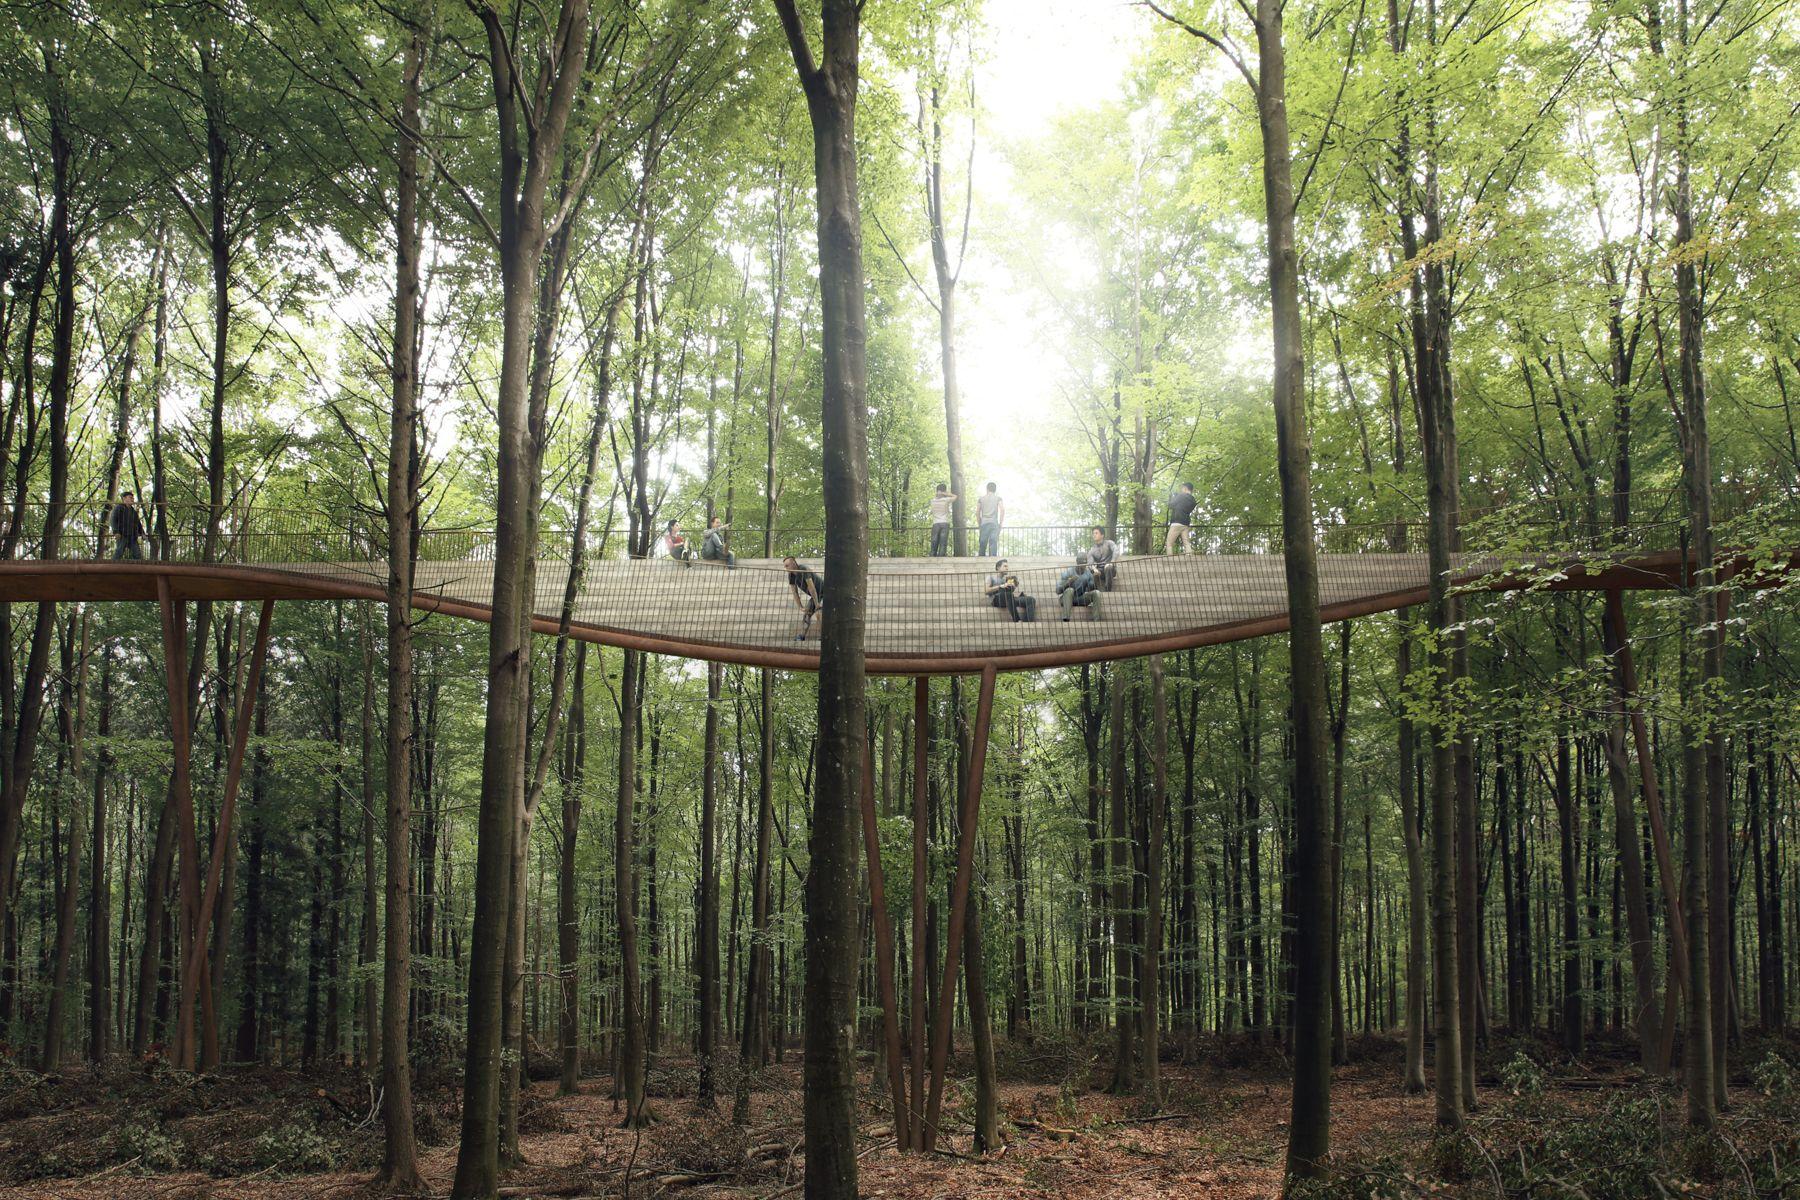 Architectural Accessibility In Nature With Denmark S Camp Adventure Landscape Architecture Danish Architecture Parking Design